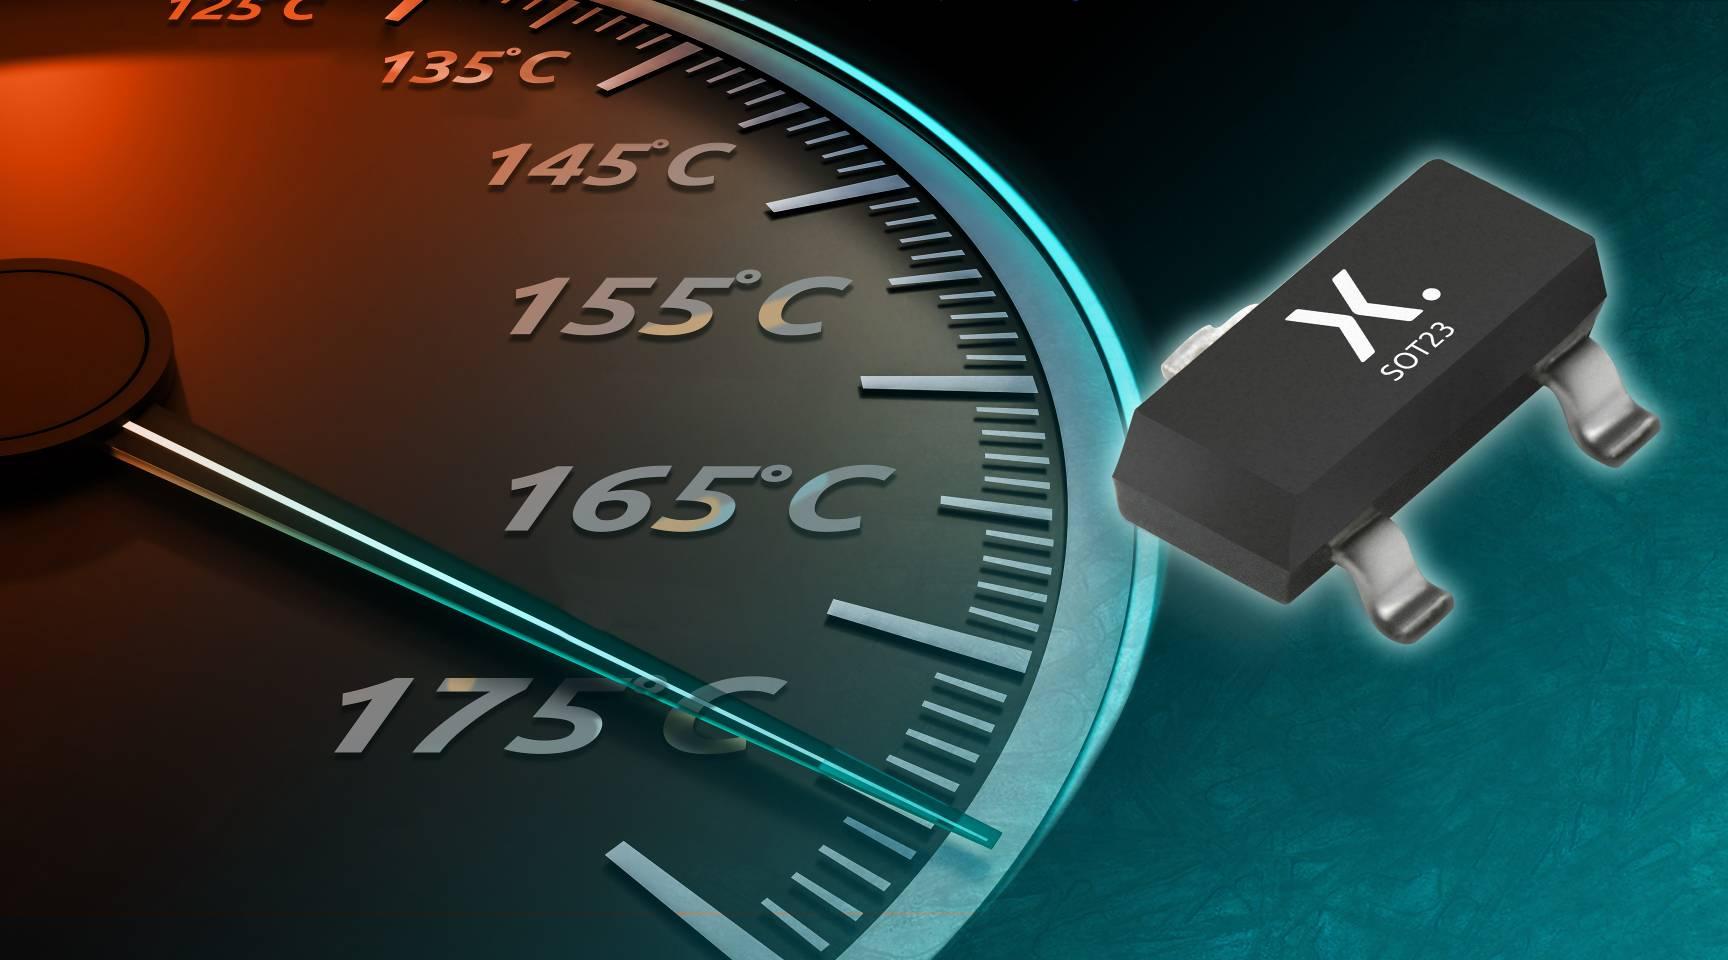 Nexperia率先推出以SOT23封装的 175℃二极管及晶体管